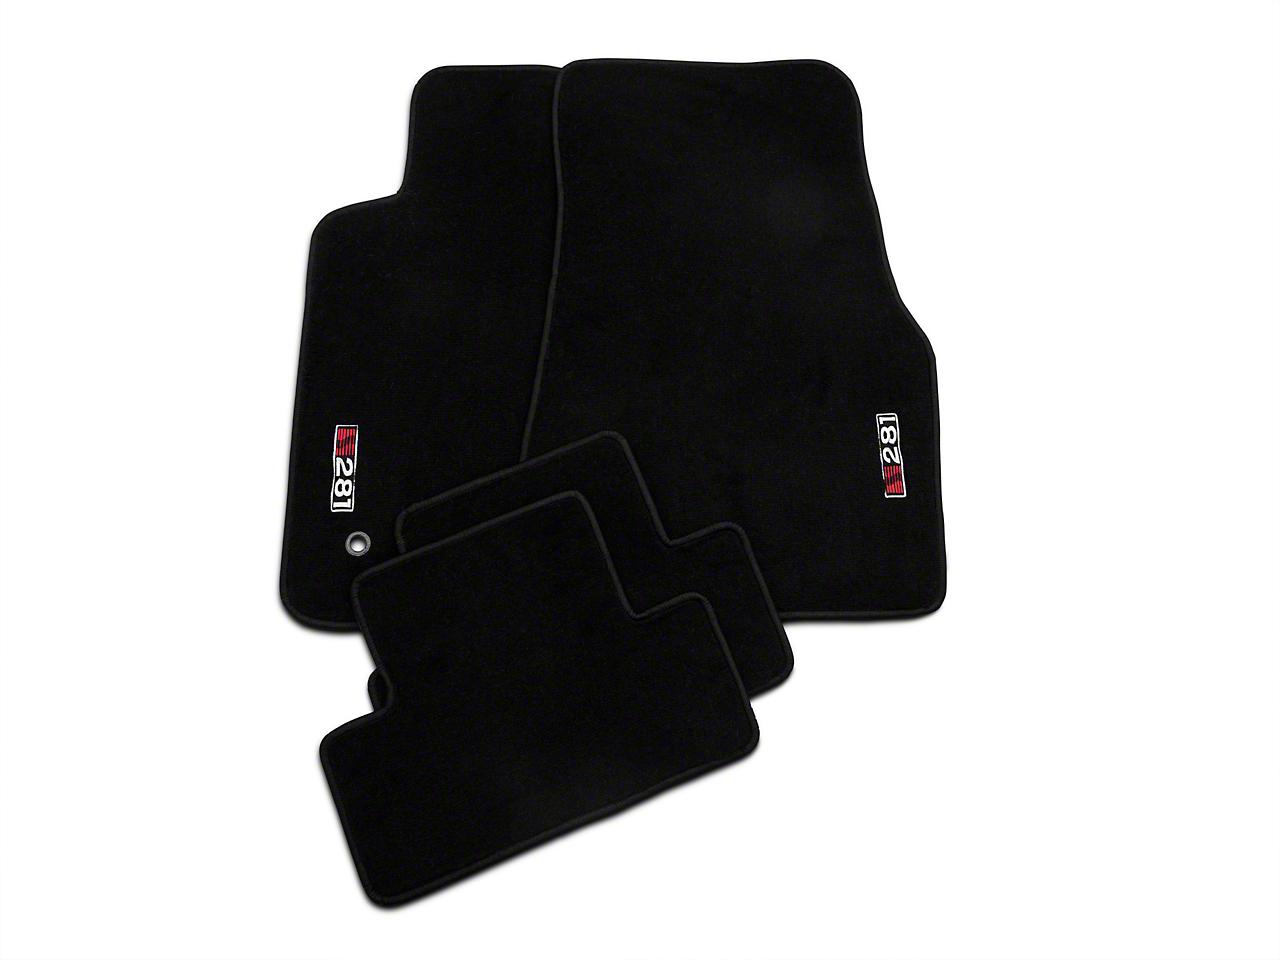 Saleen Front & Rear Floor Mats w/ S281 Logo - Black (05-09 All)